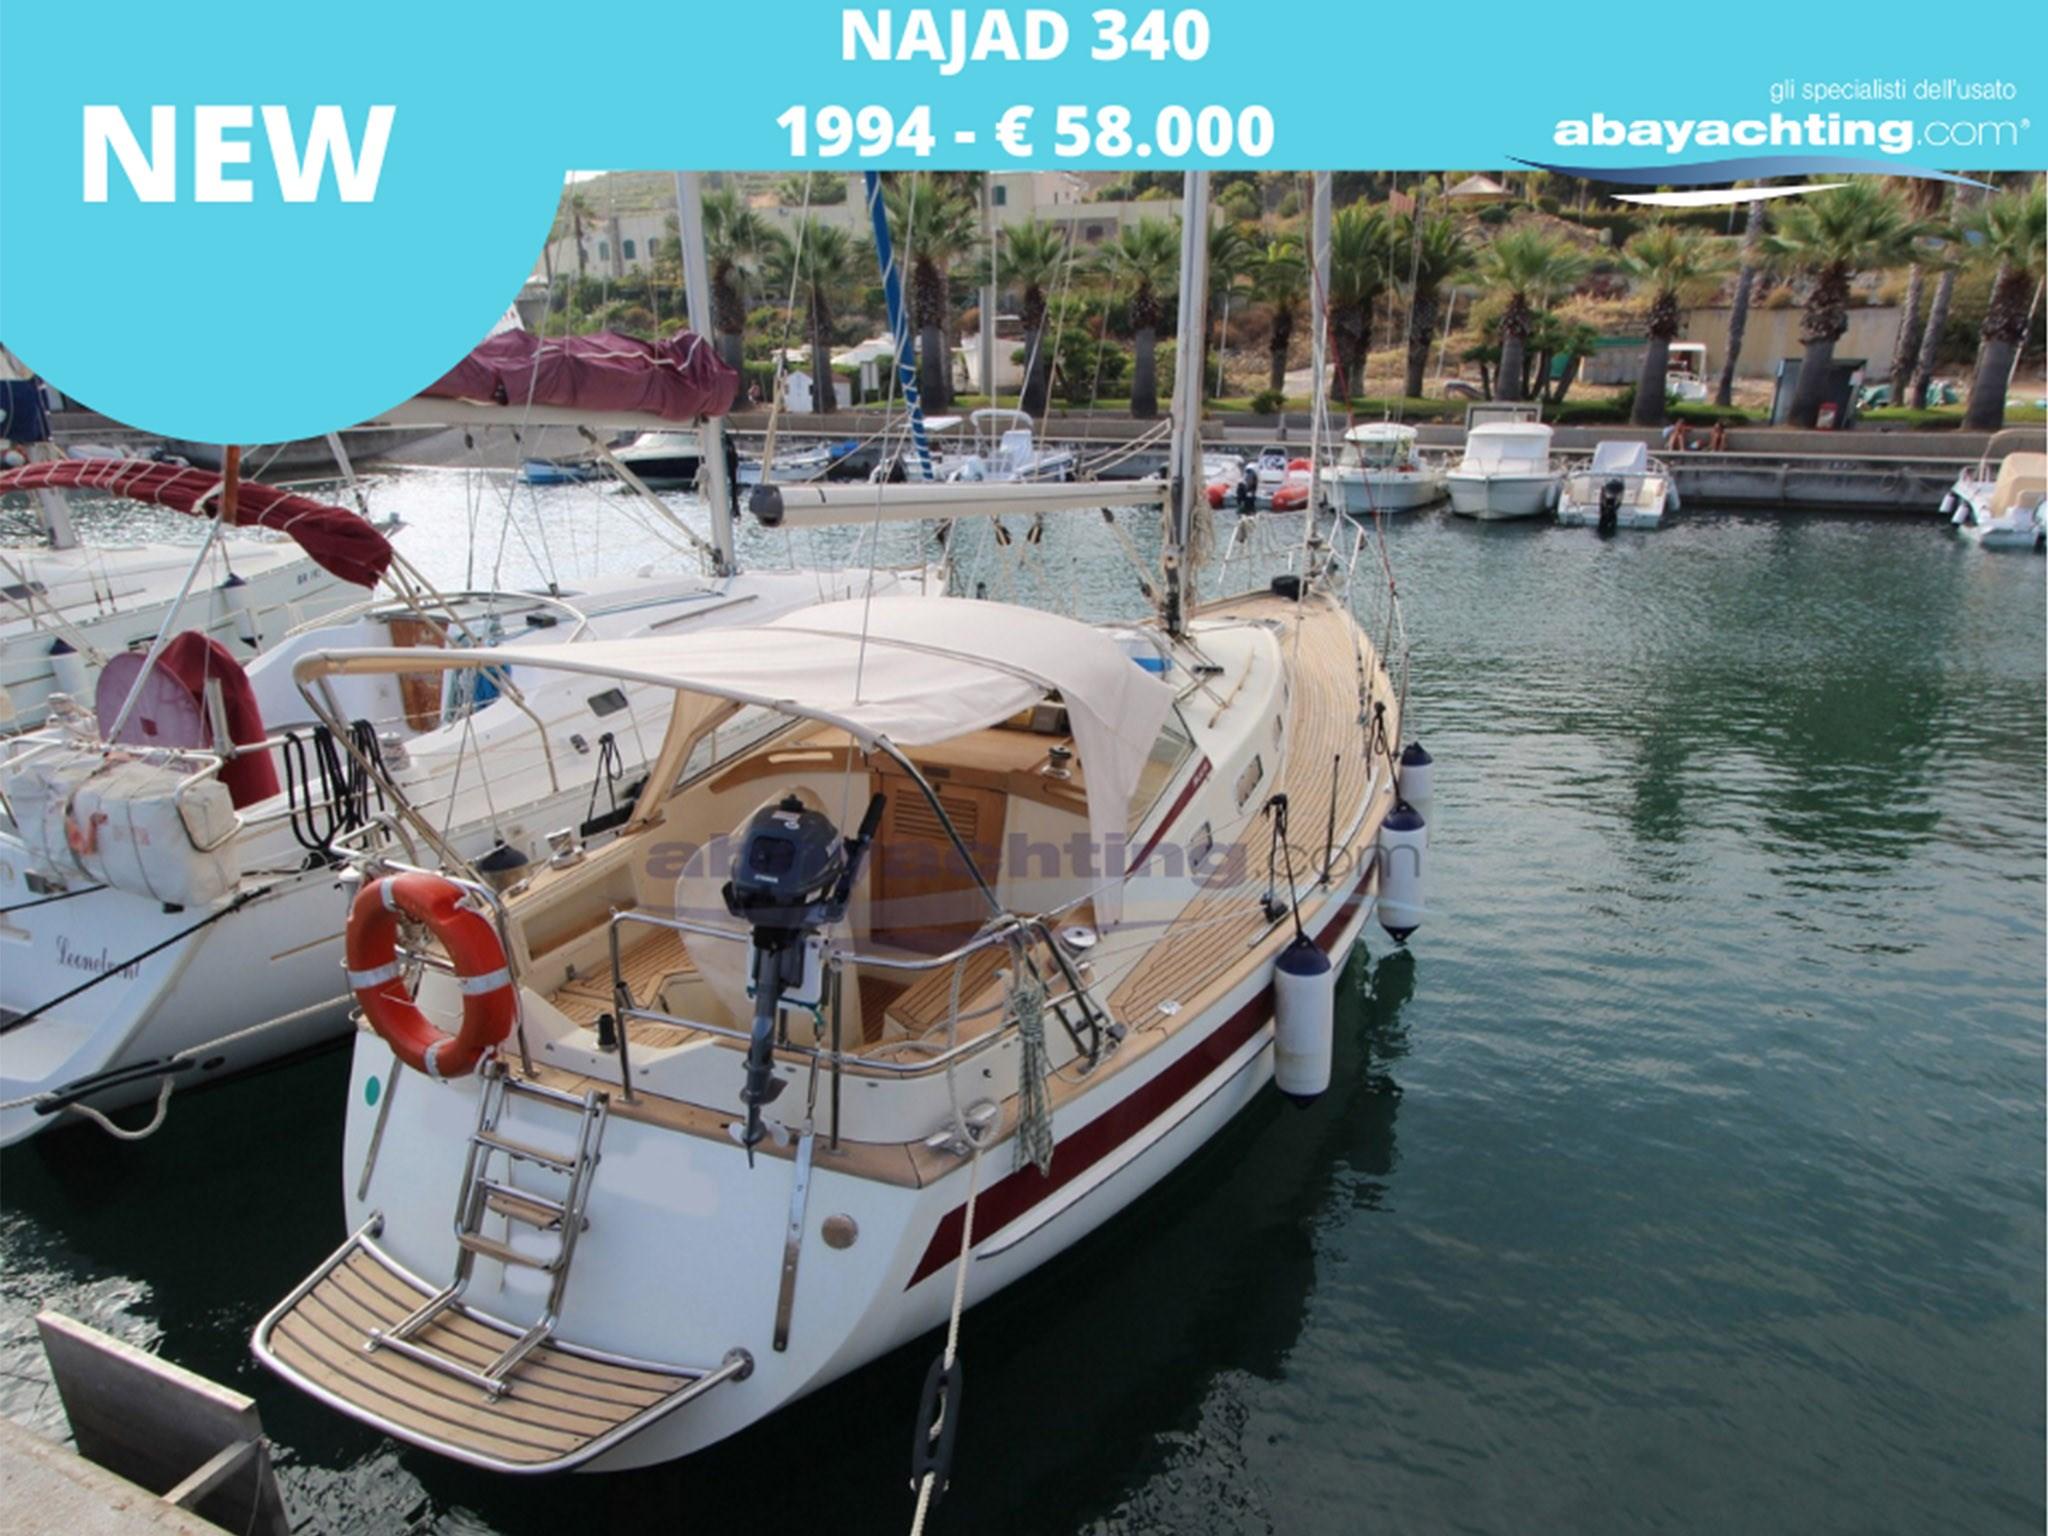 New arrival Najad 340